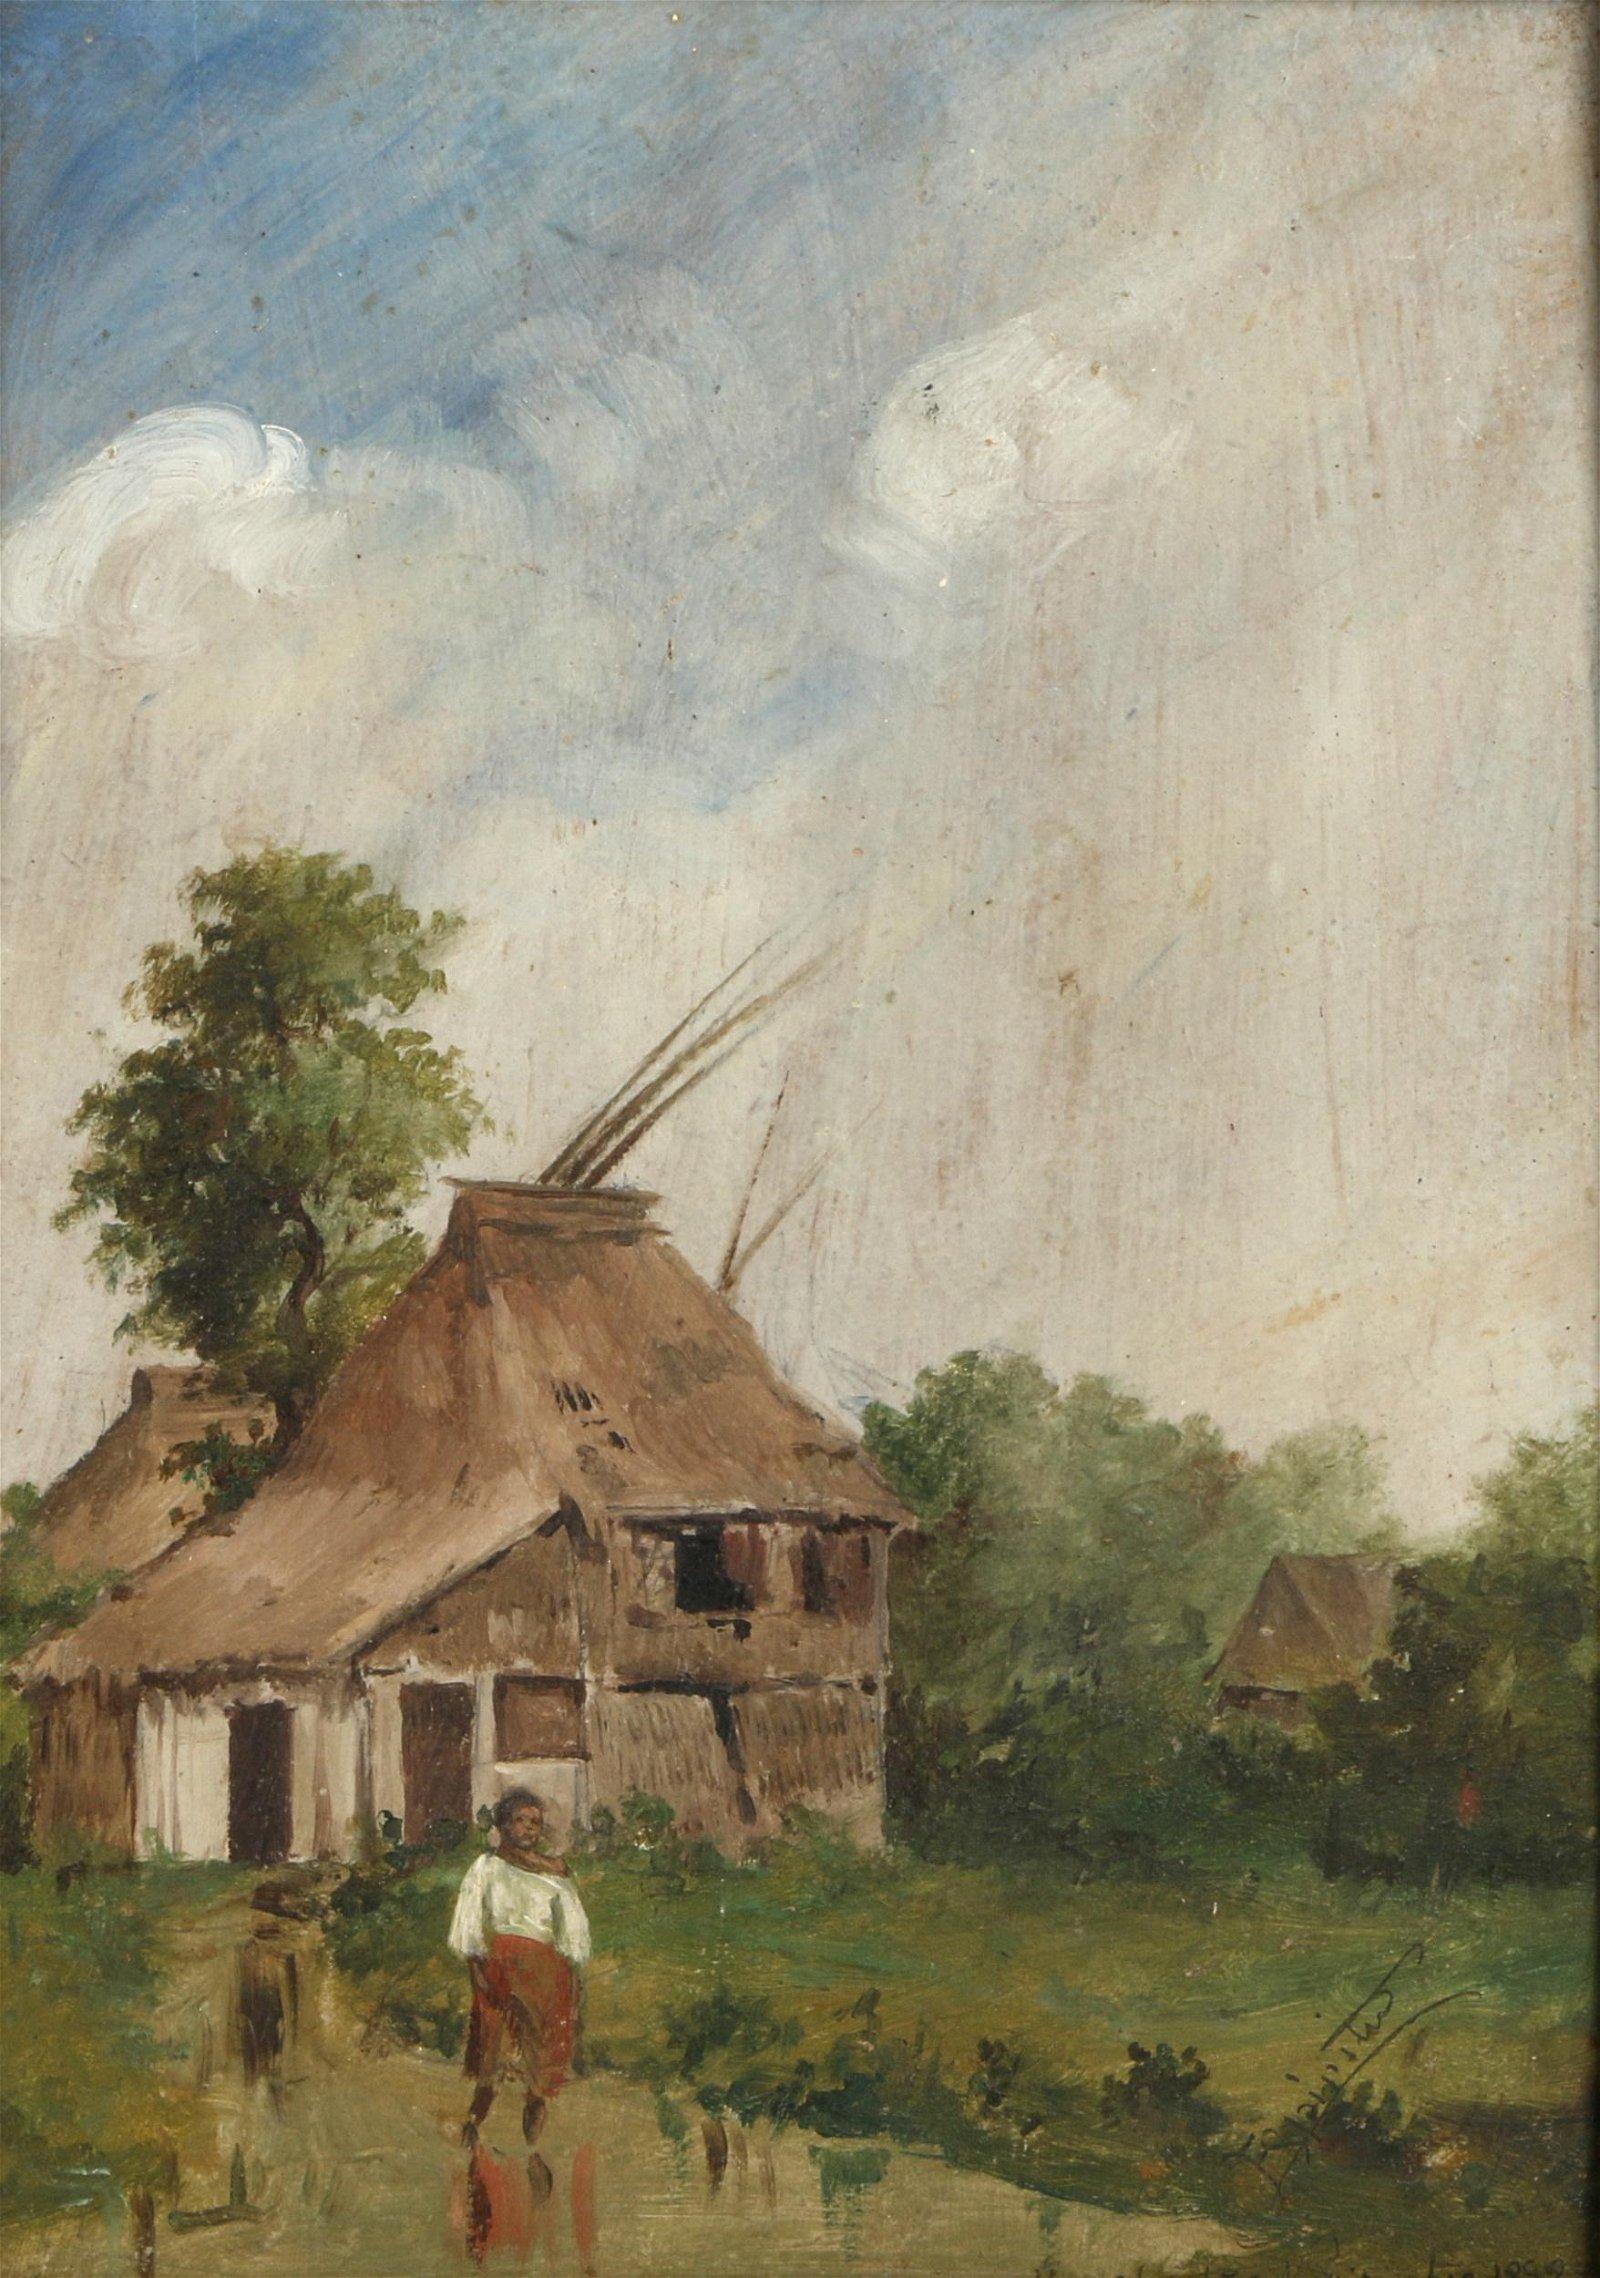 Anselmo Espiritu (Filipino 19th century) Village Scene